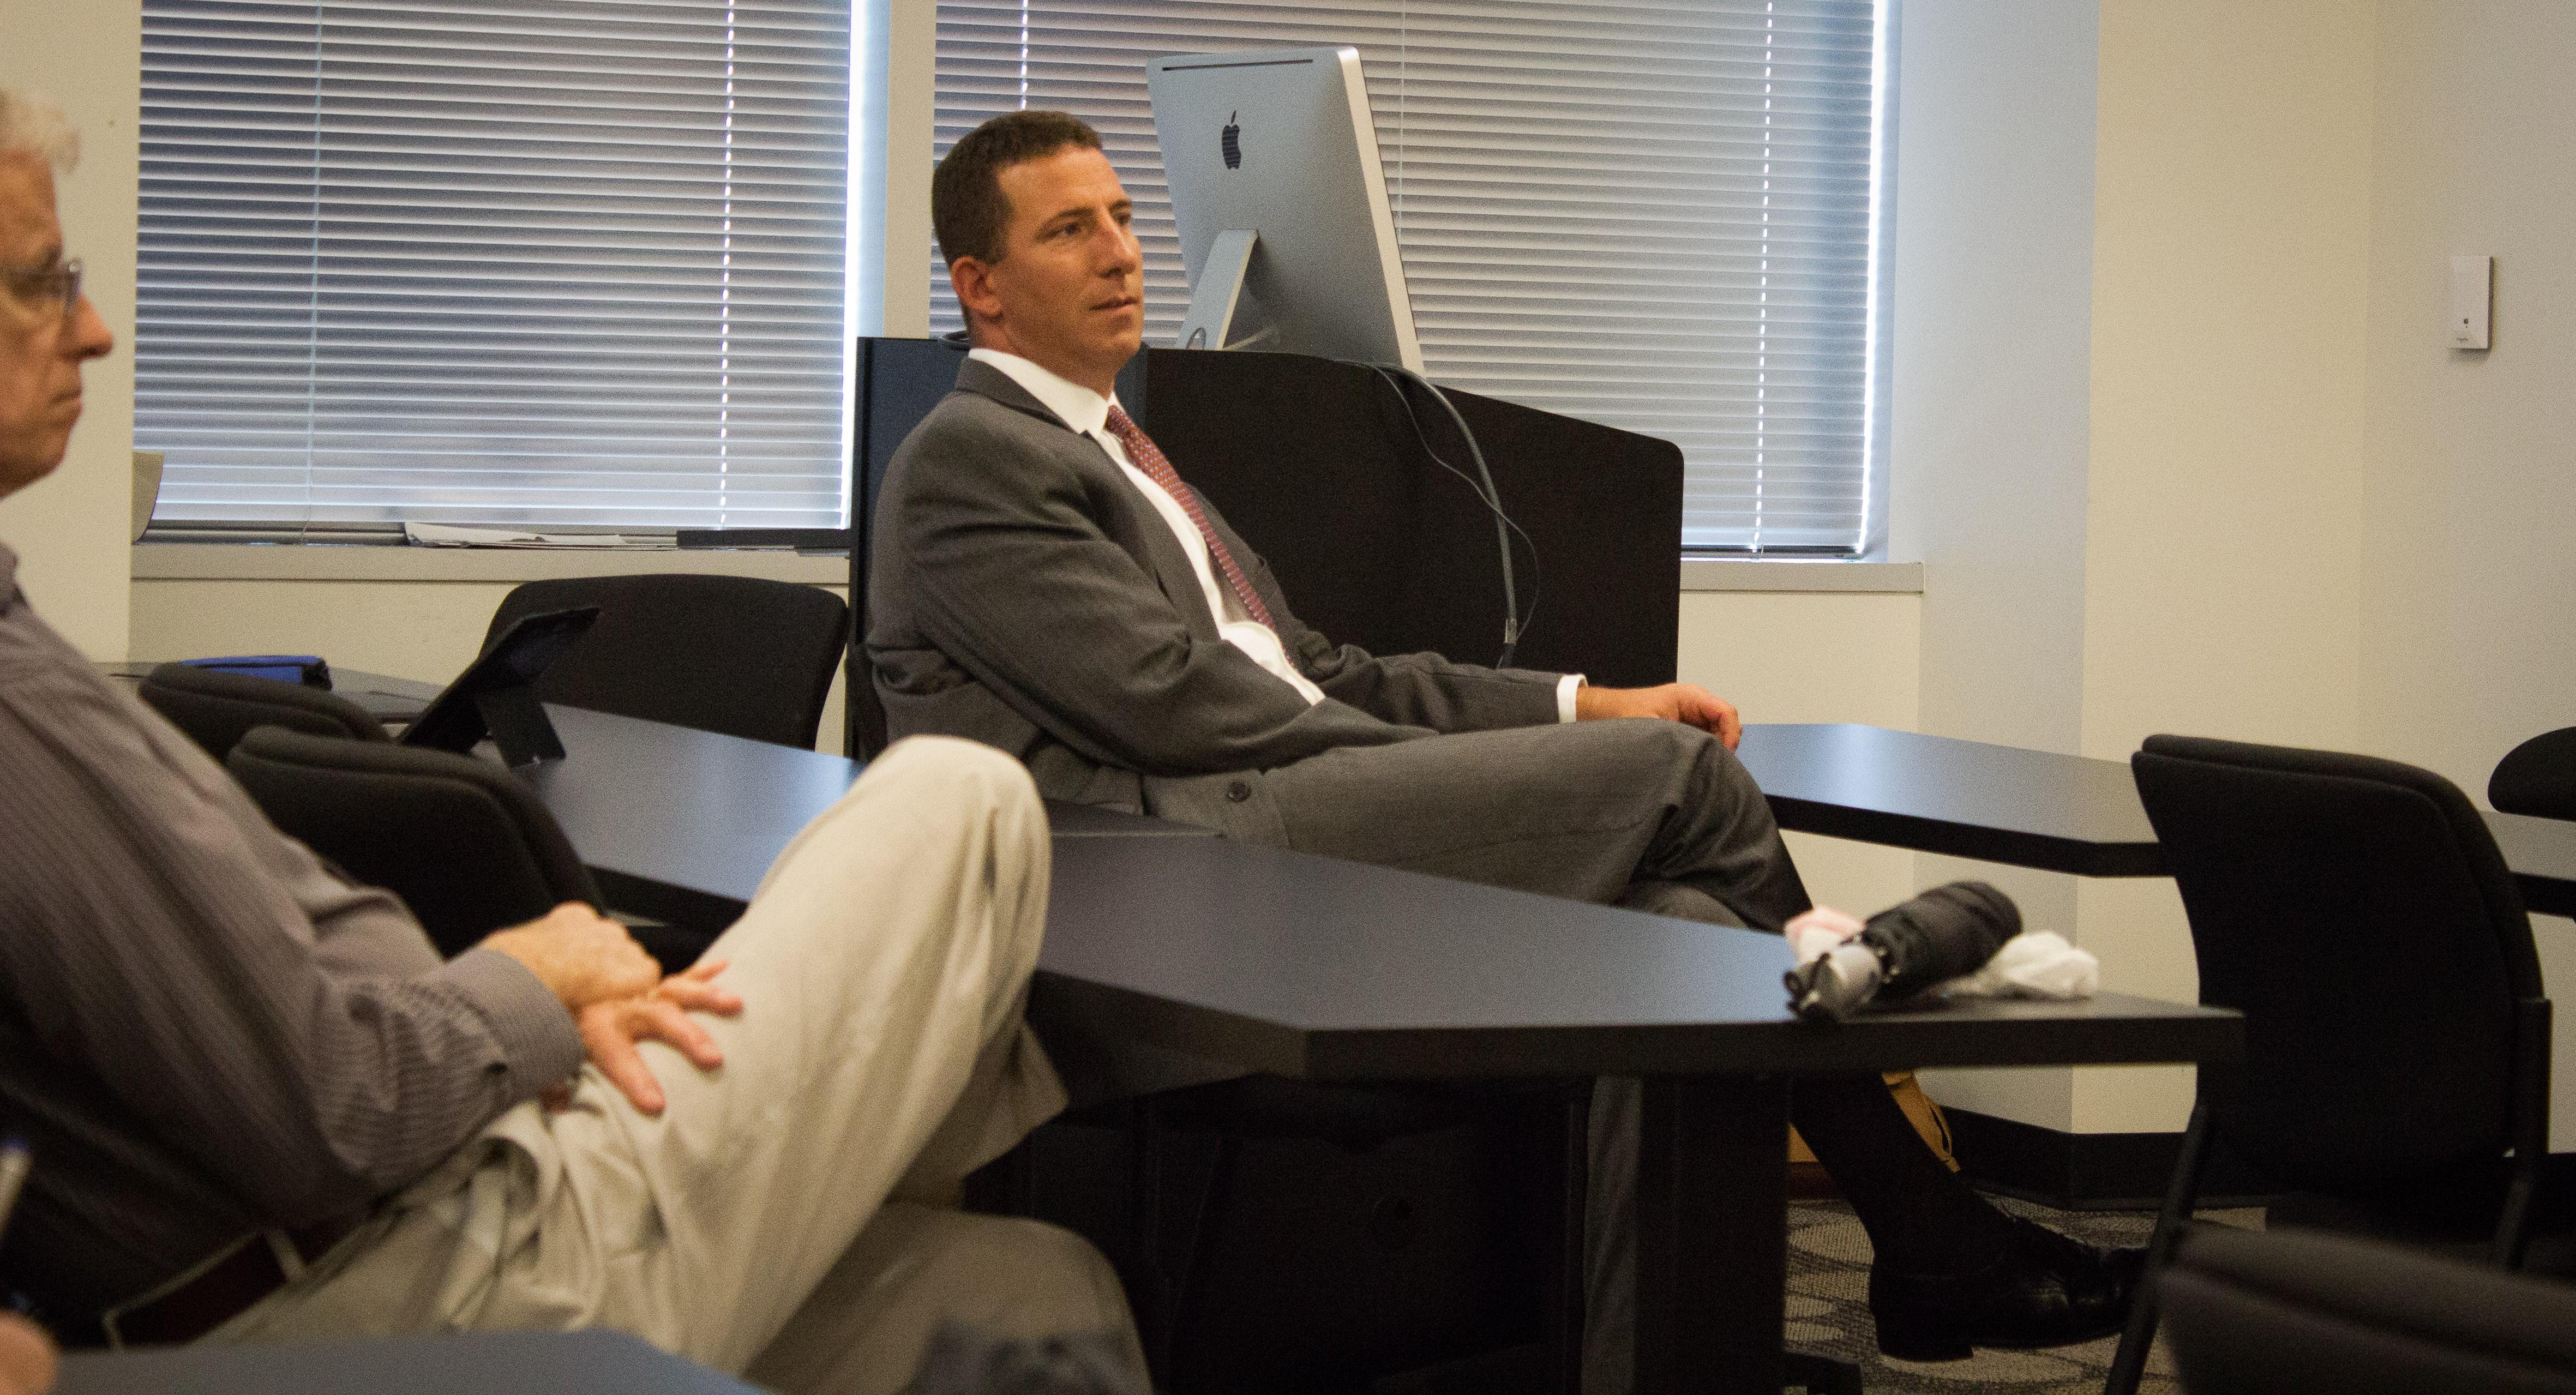 Houston Website Designers Schipul Public Speaking 2012-7